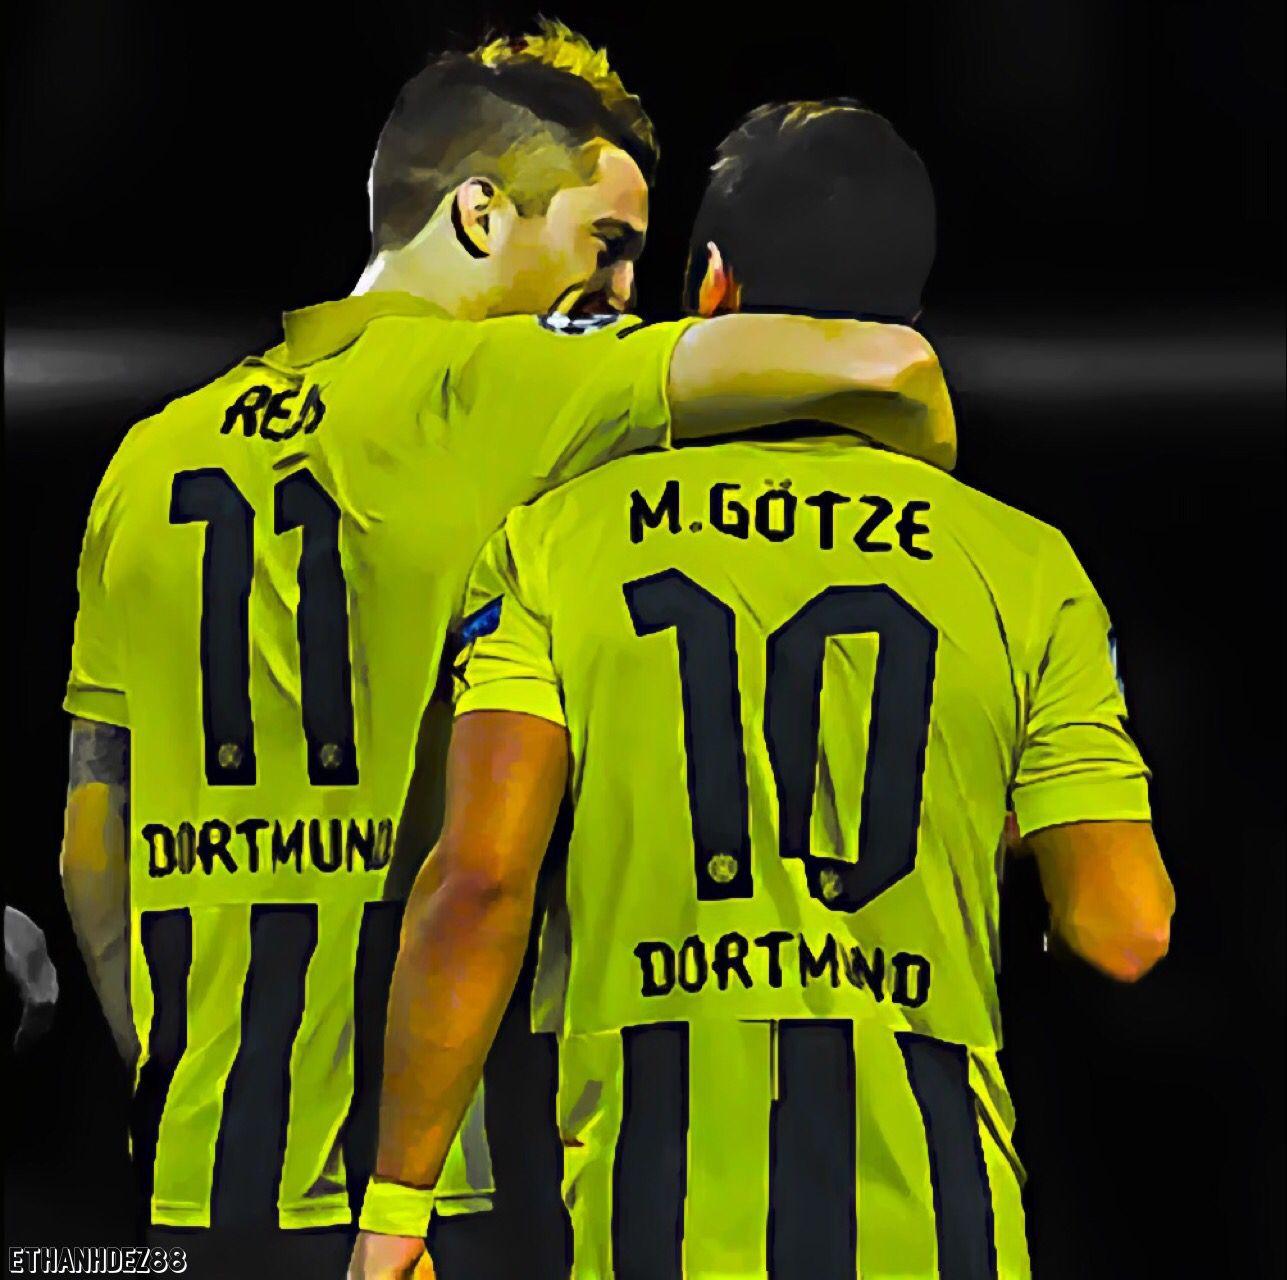 Marco Reus & Mario Gotze Borussia Dortmund Friendship